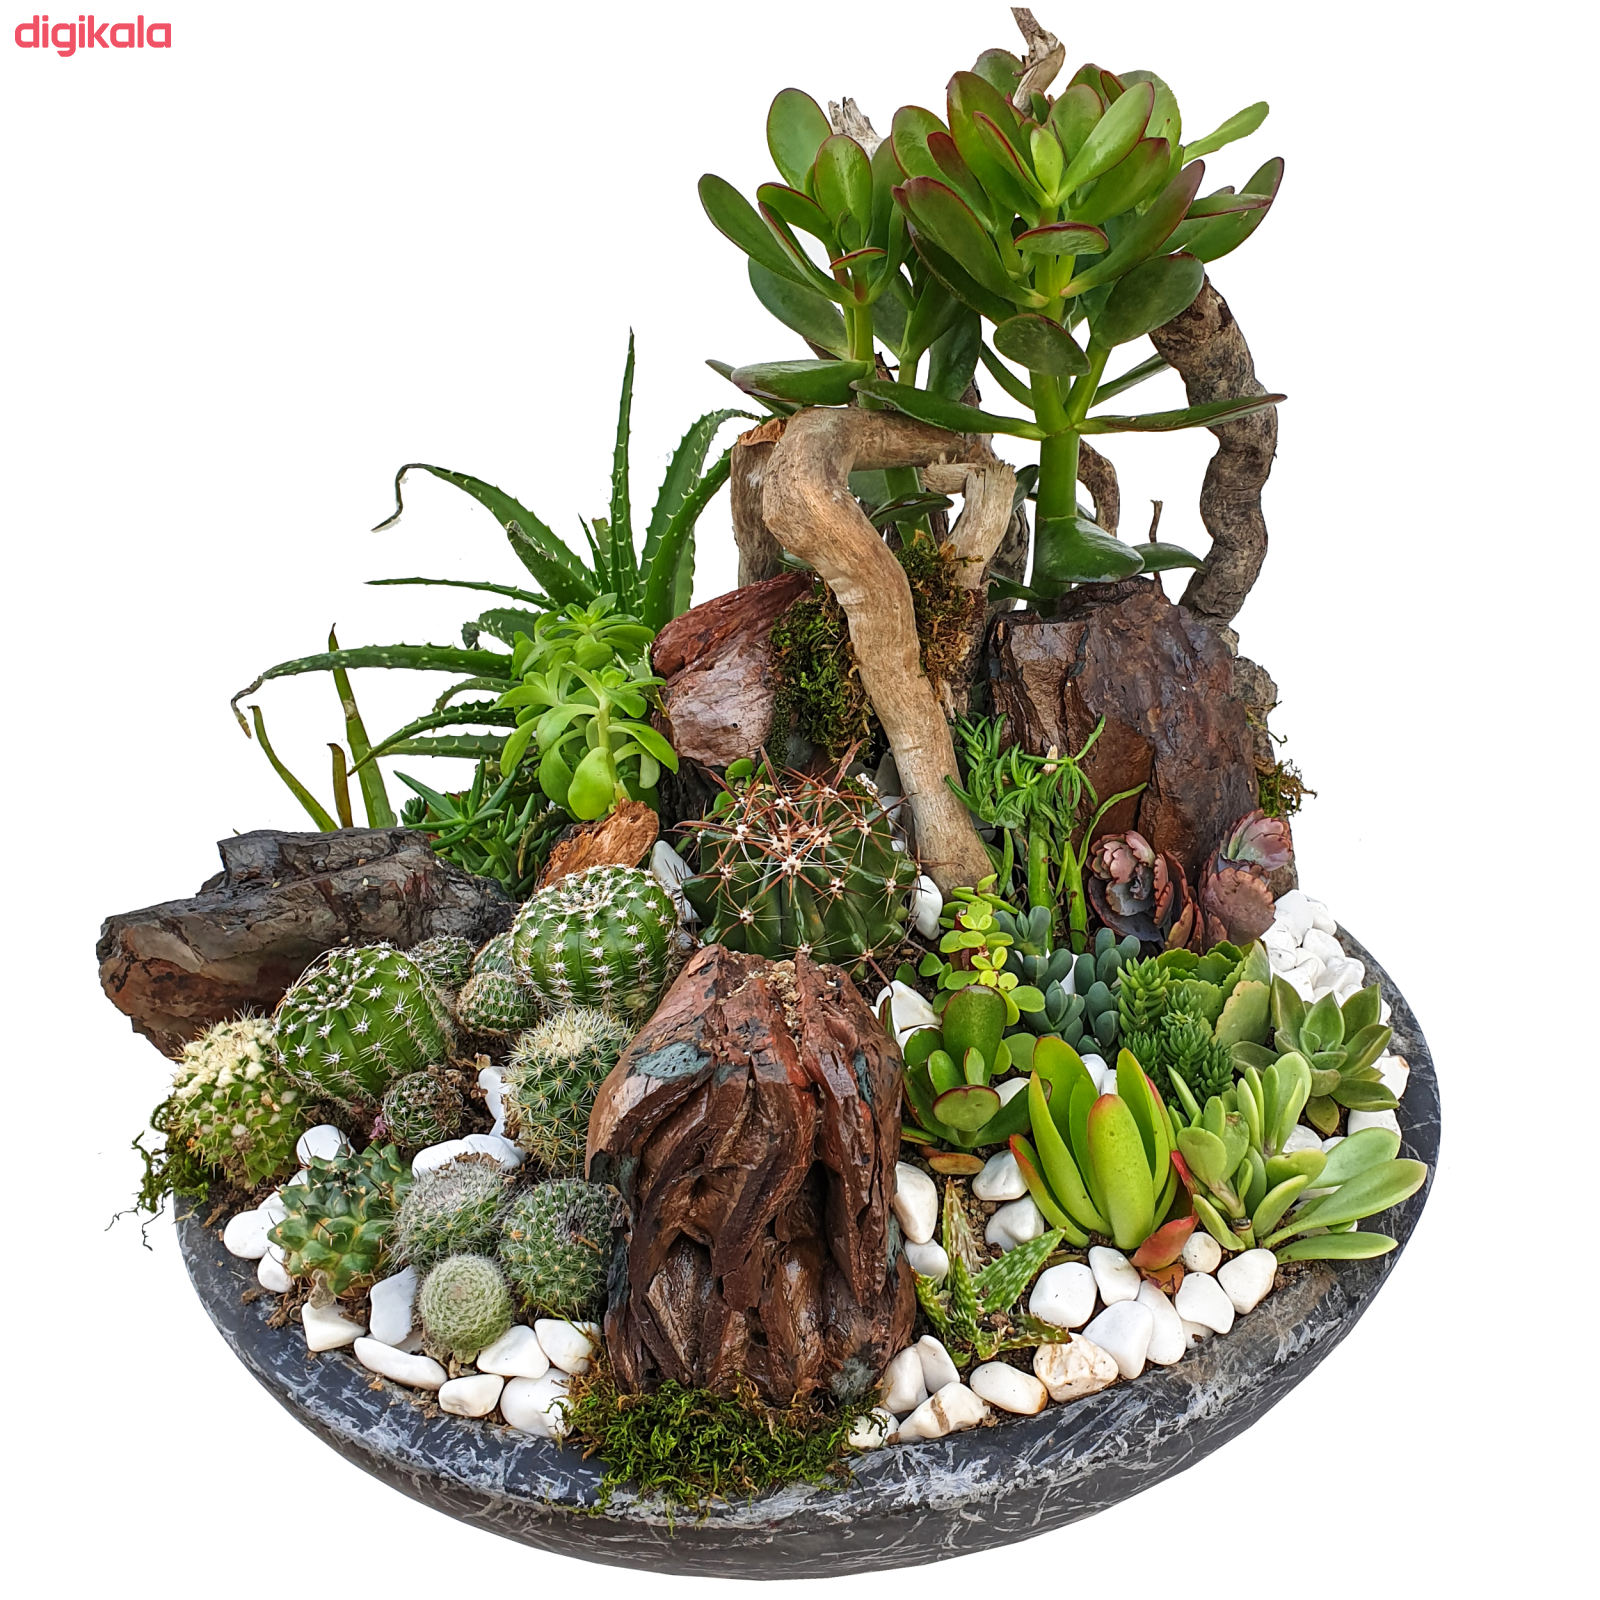 گیاه طبیعی کاکتوس مدل MK-99006 main 1 2